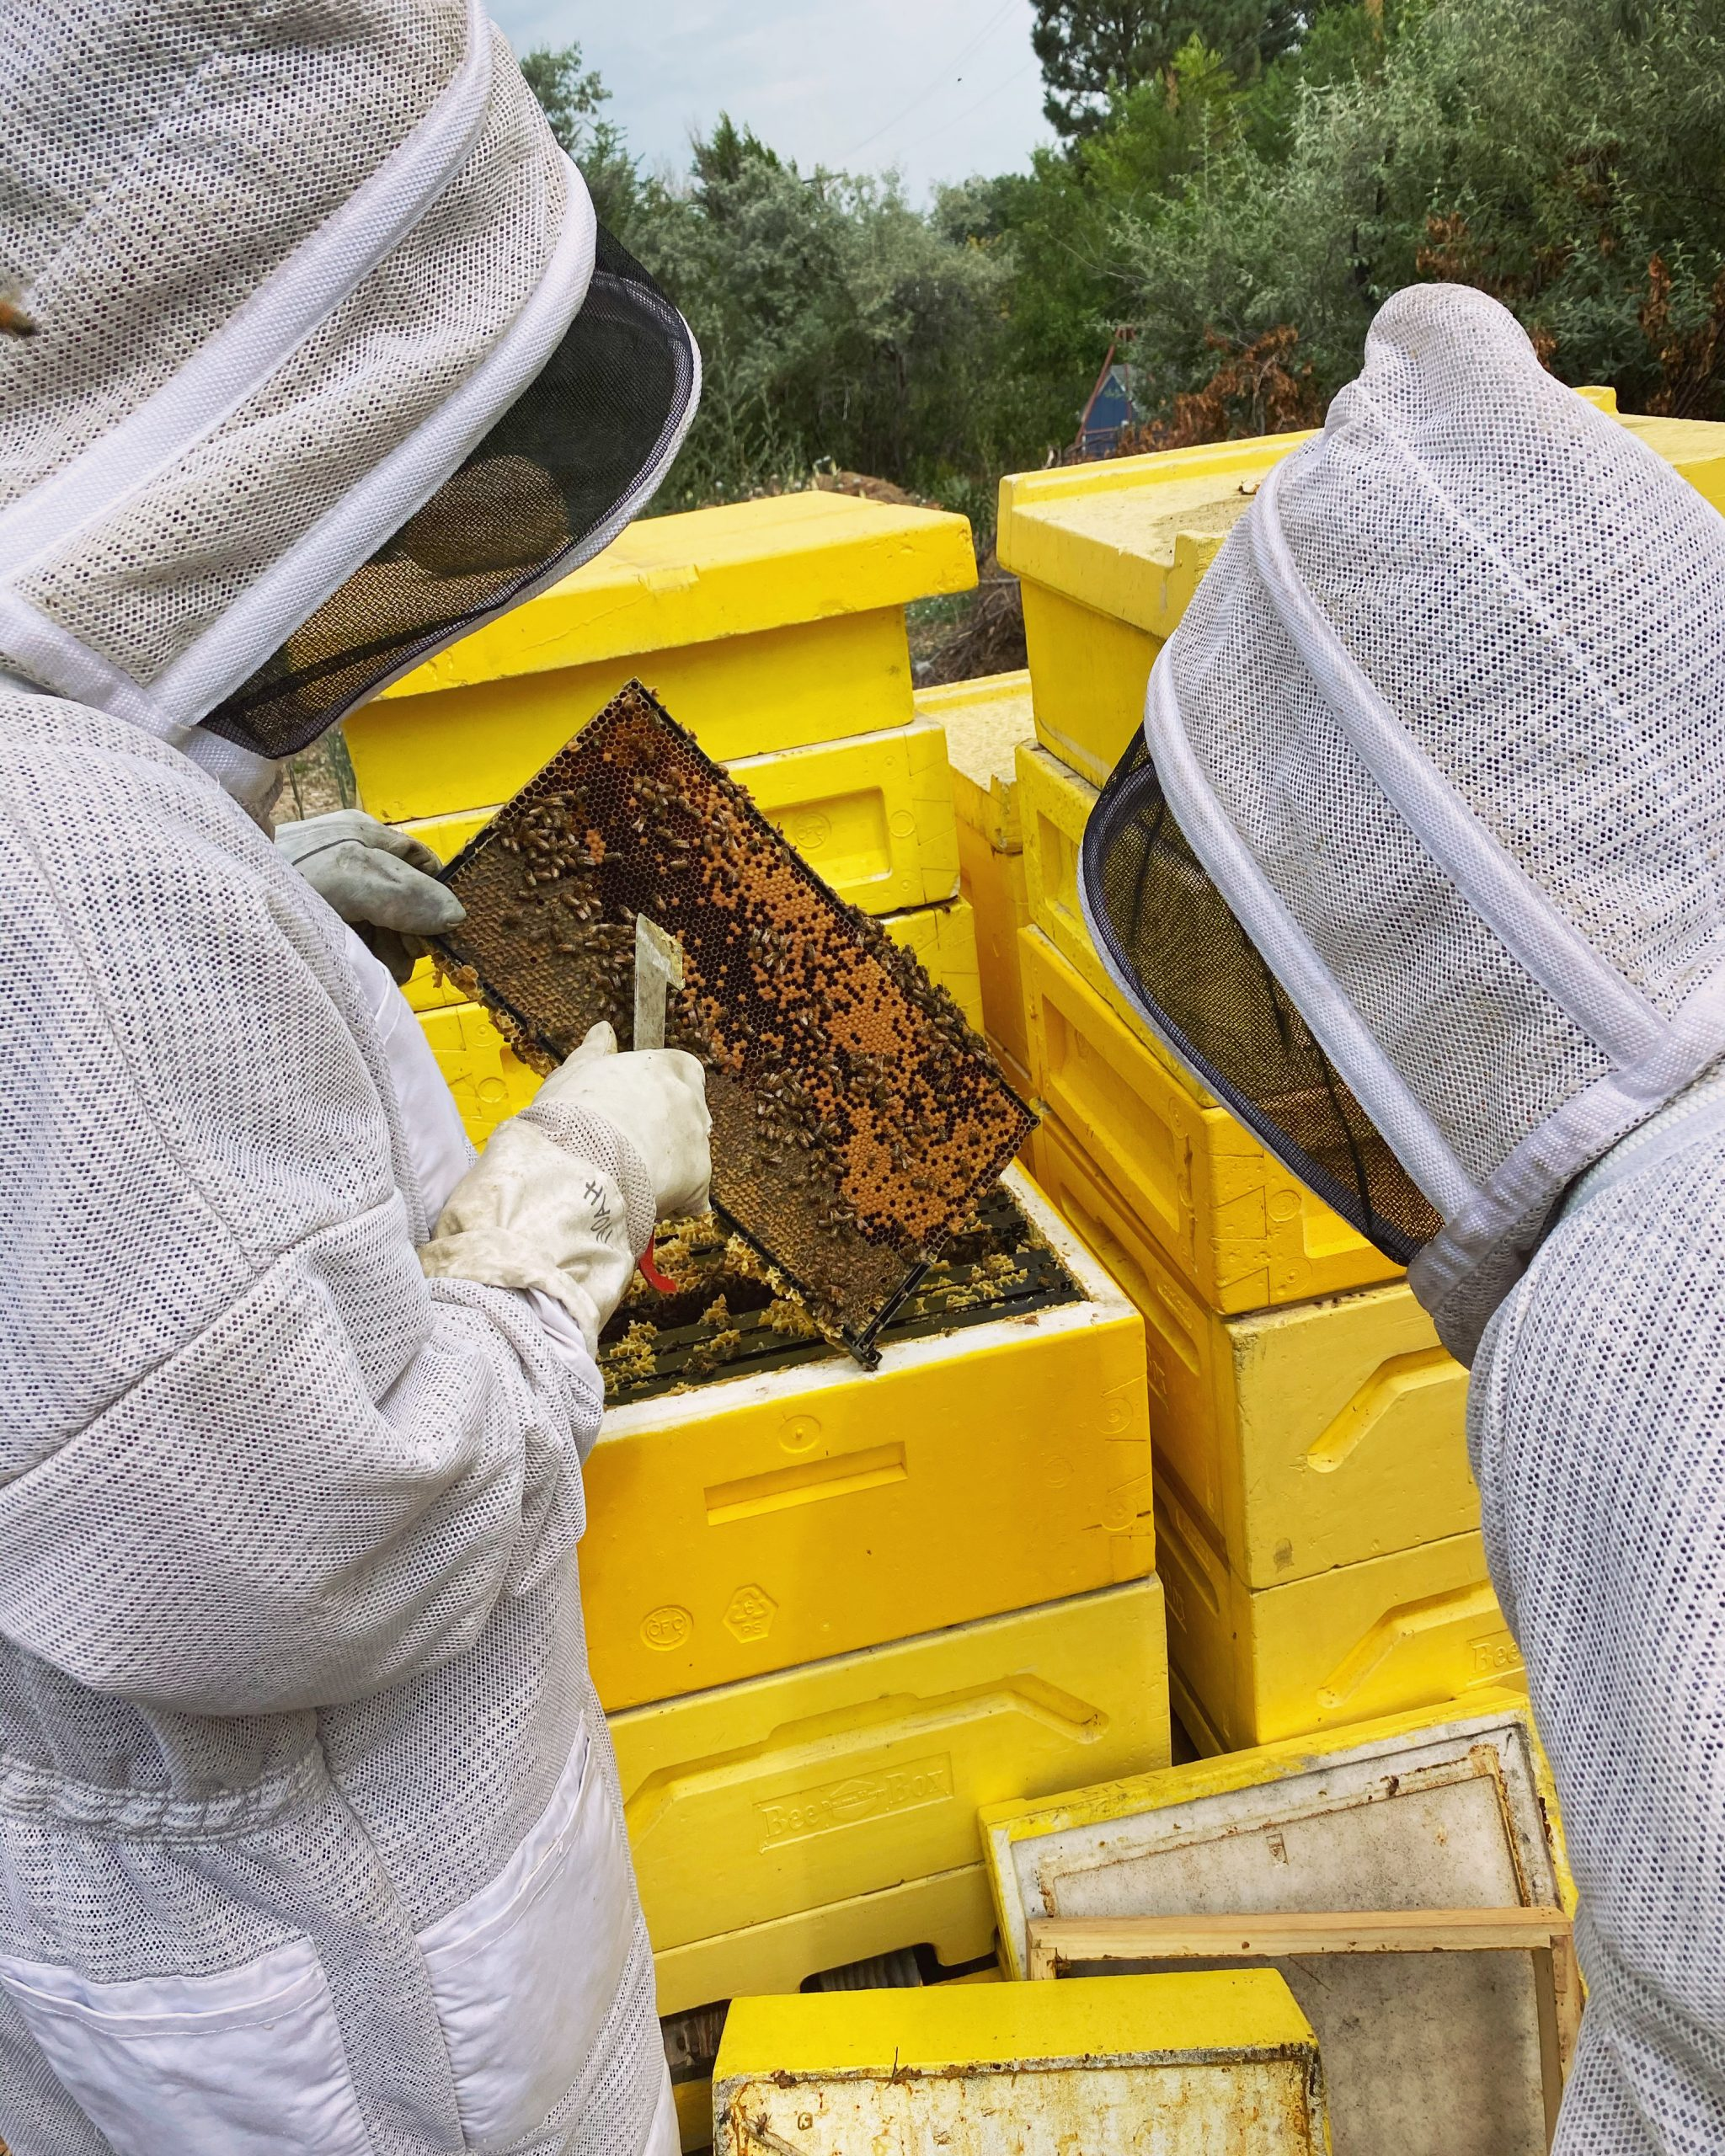 Bjorns Colorado Honey - Beekeepers with Honey Frame